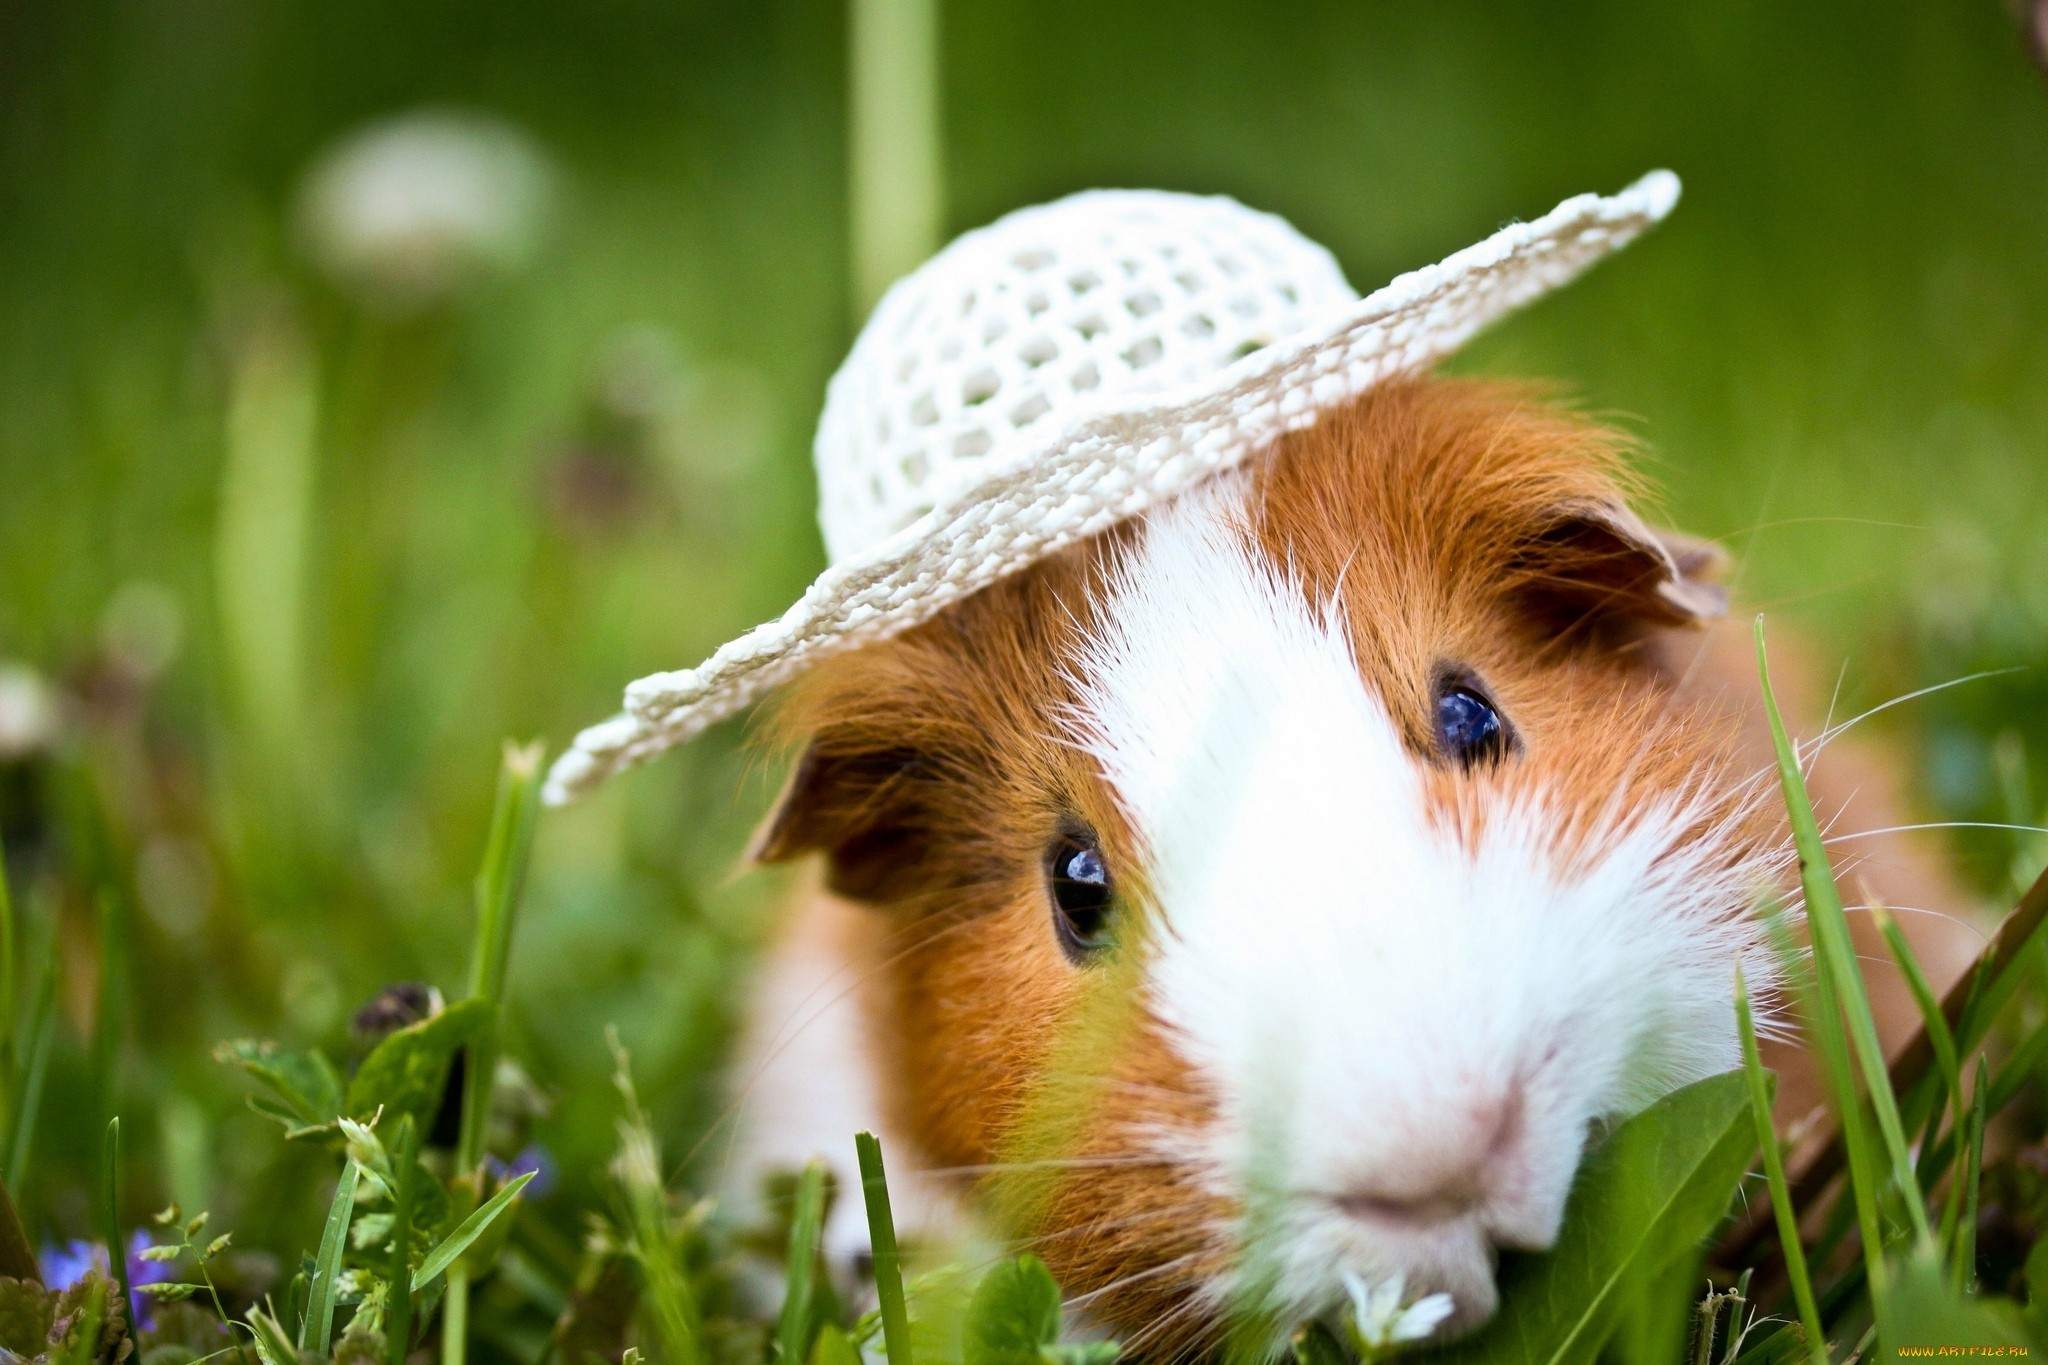 Res: 2048x1365, Cute Guinea Pigs Eating Wallpaper